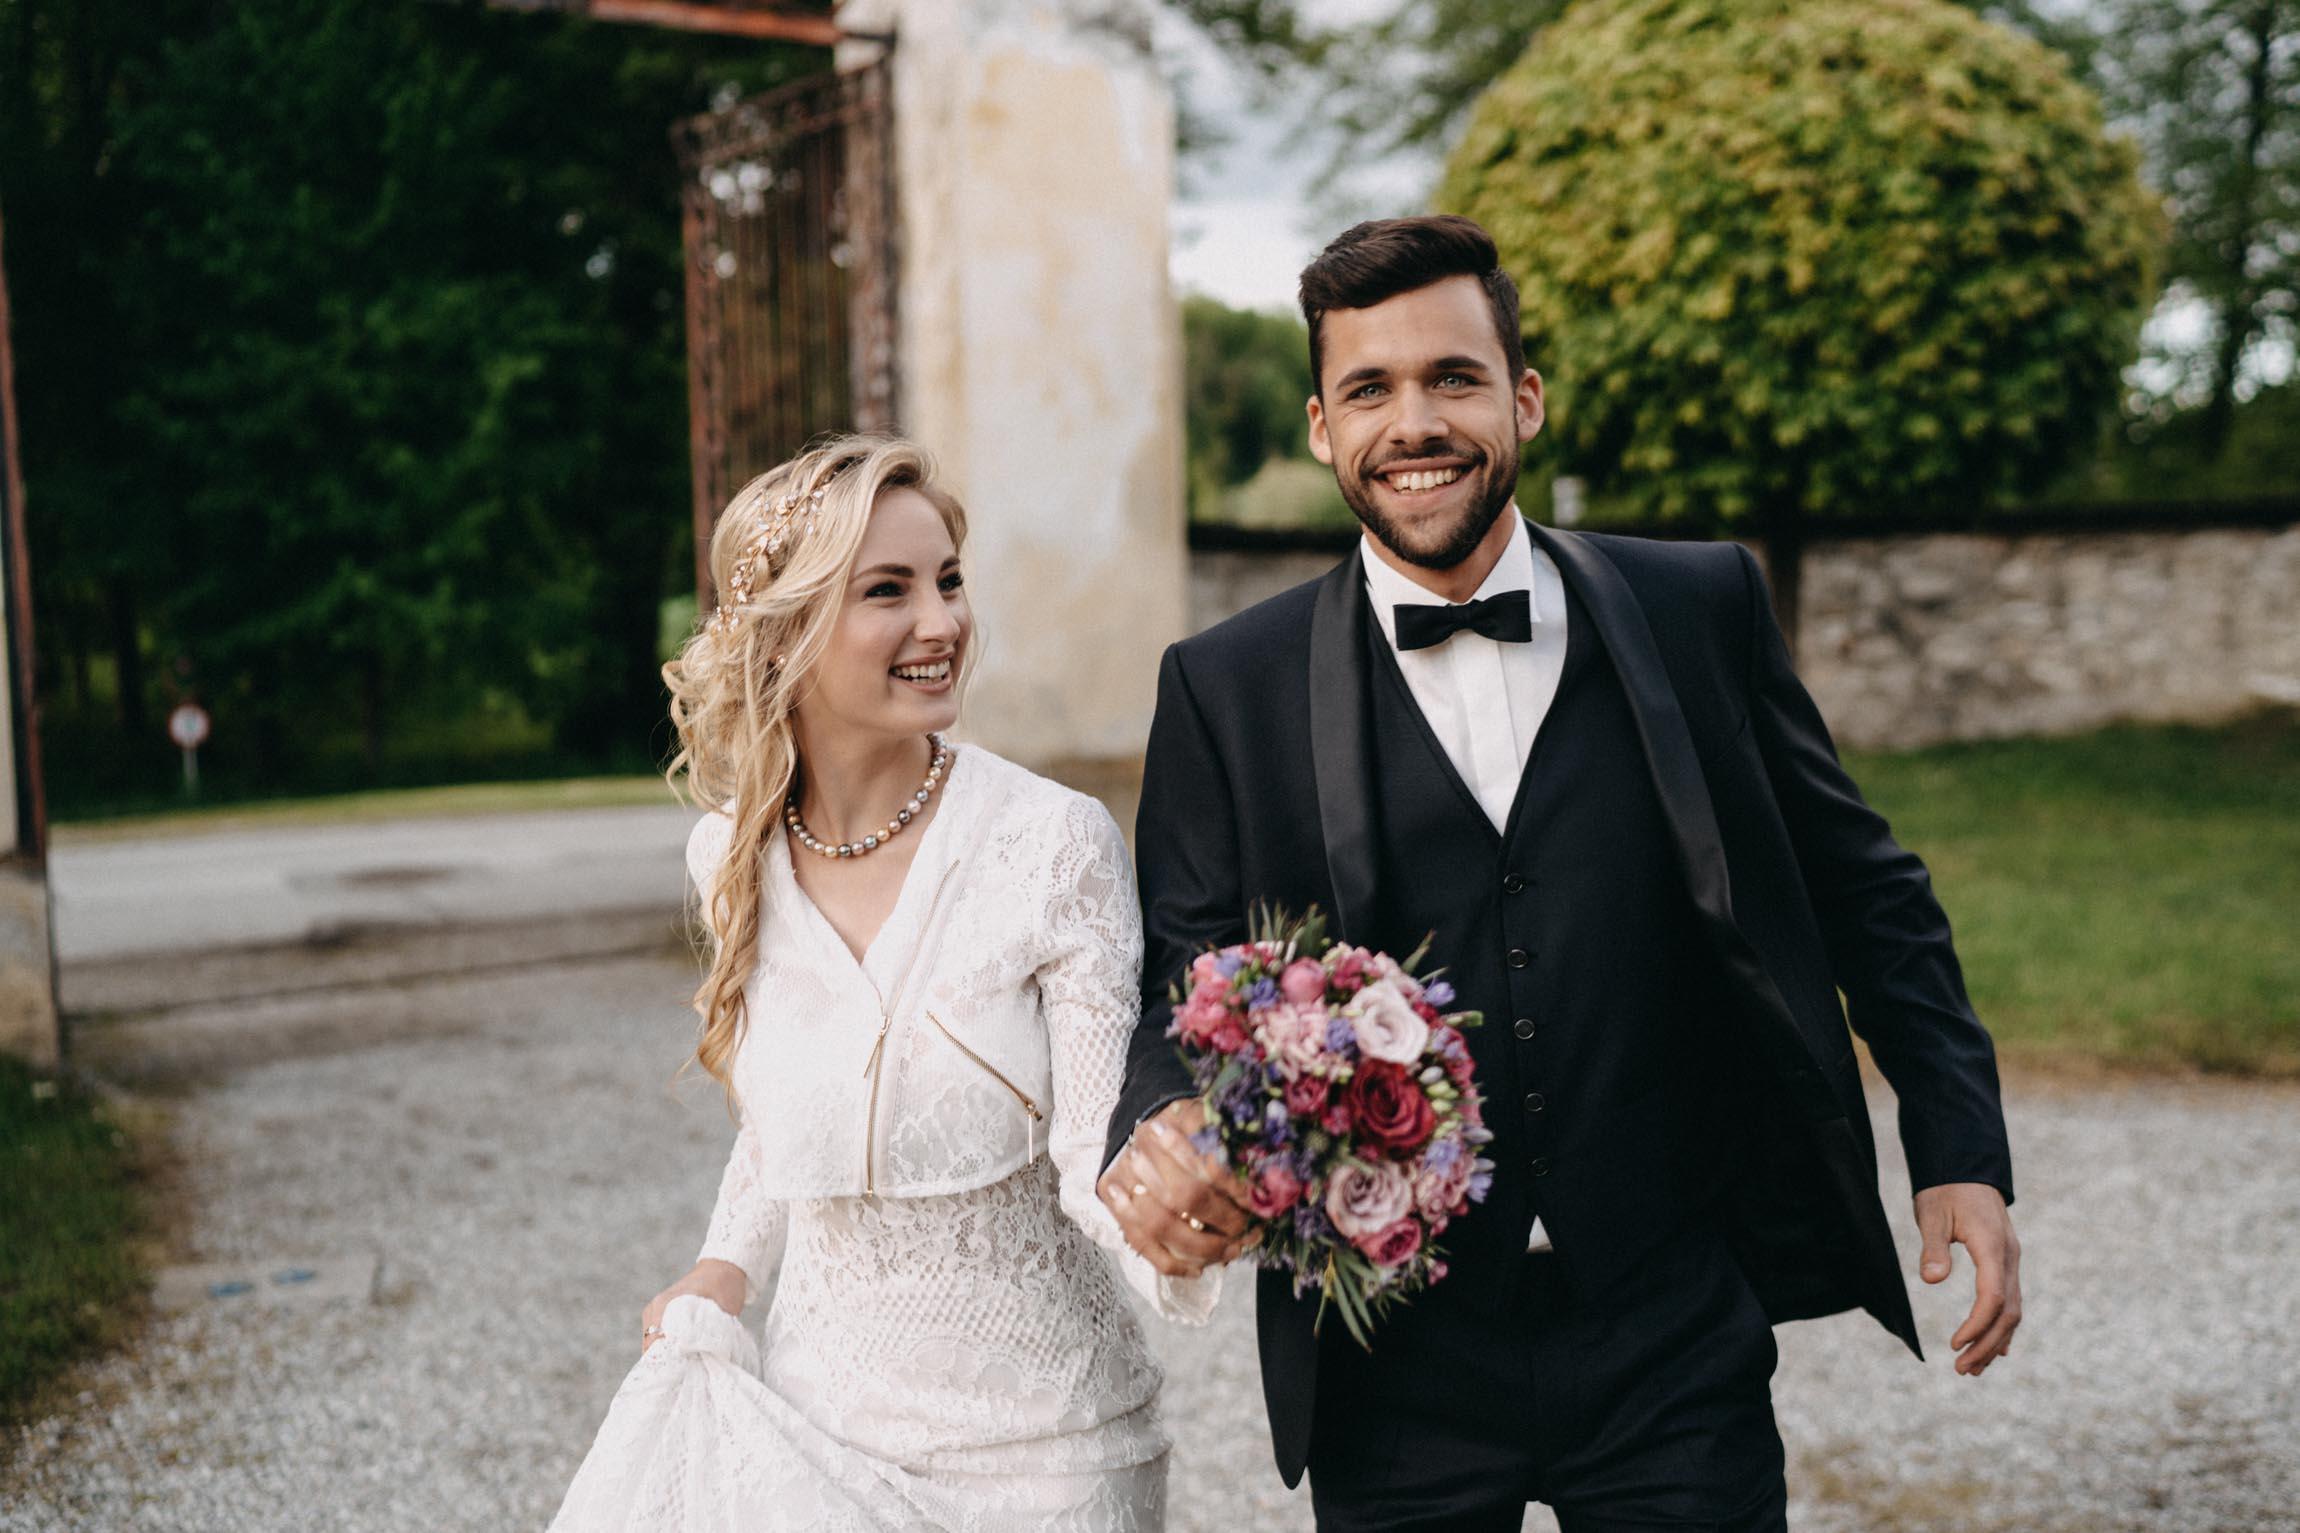 GLÜCKWÄRTS Wedding & Events